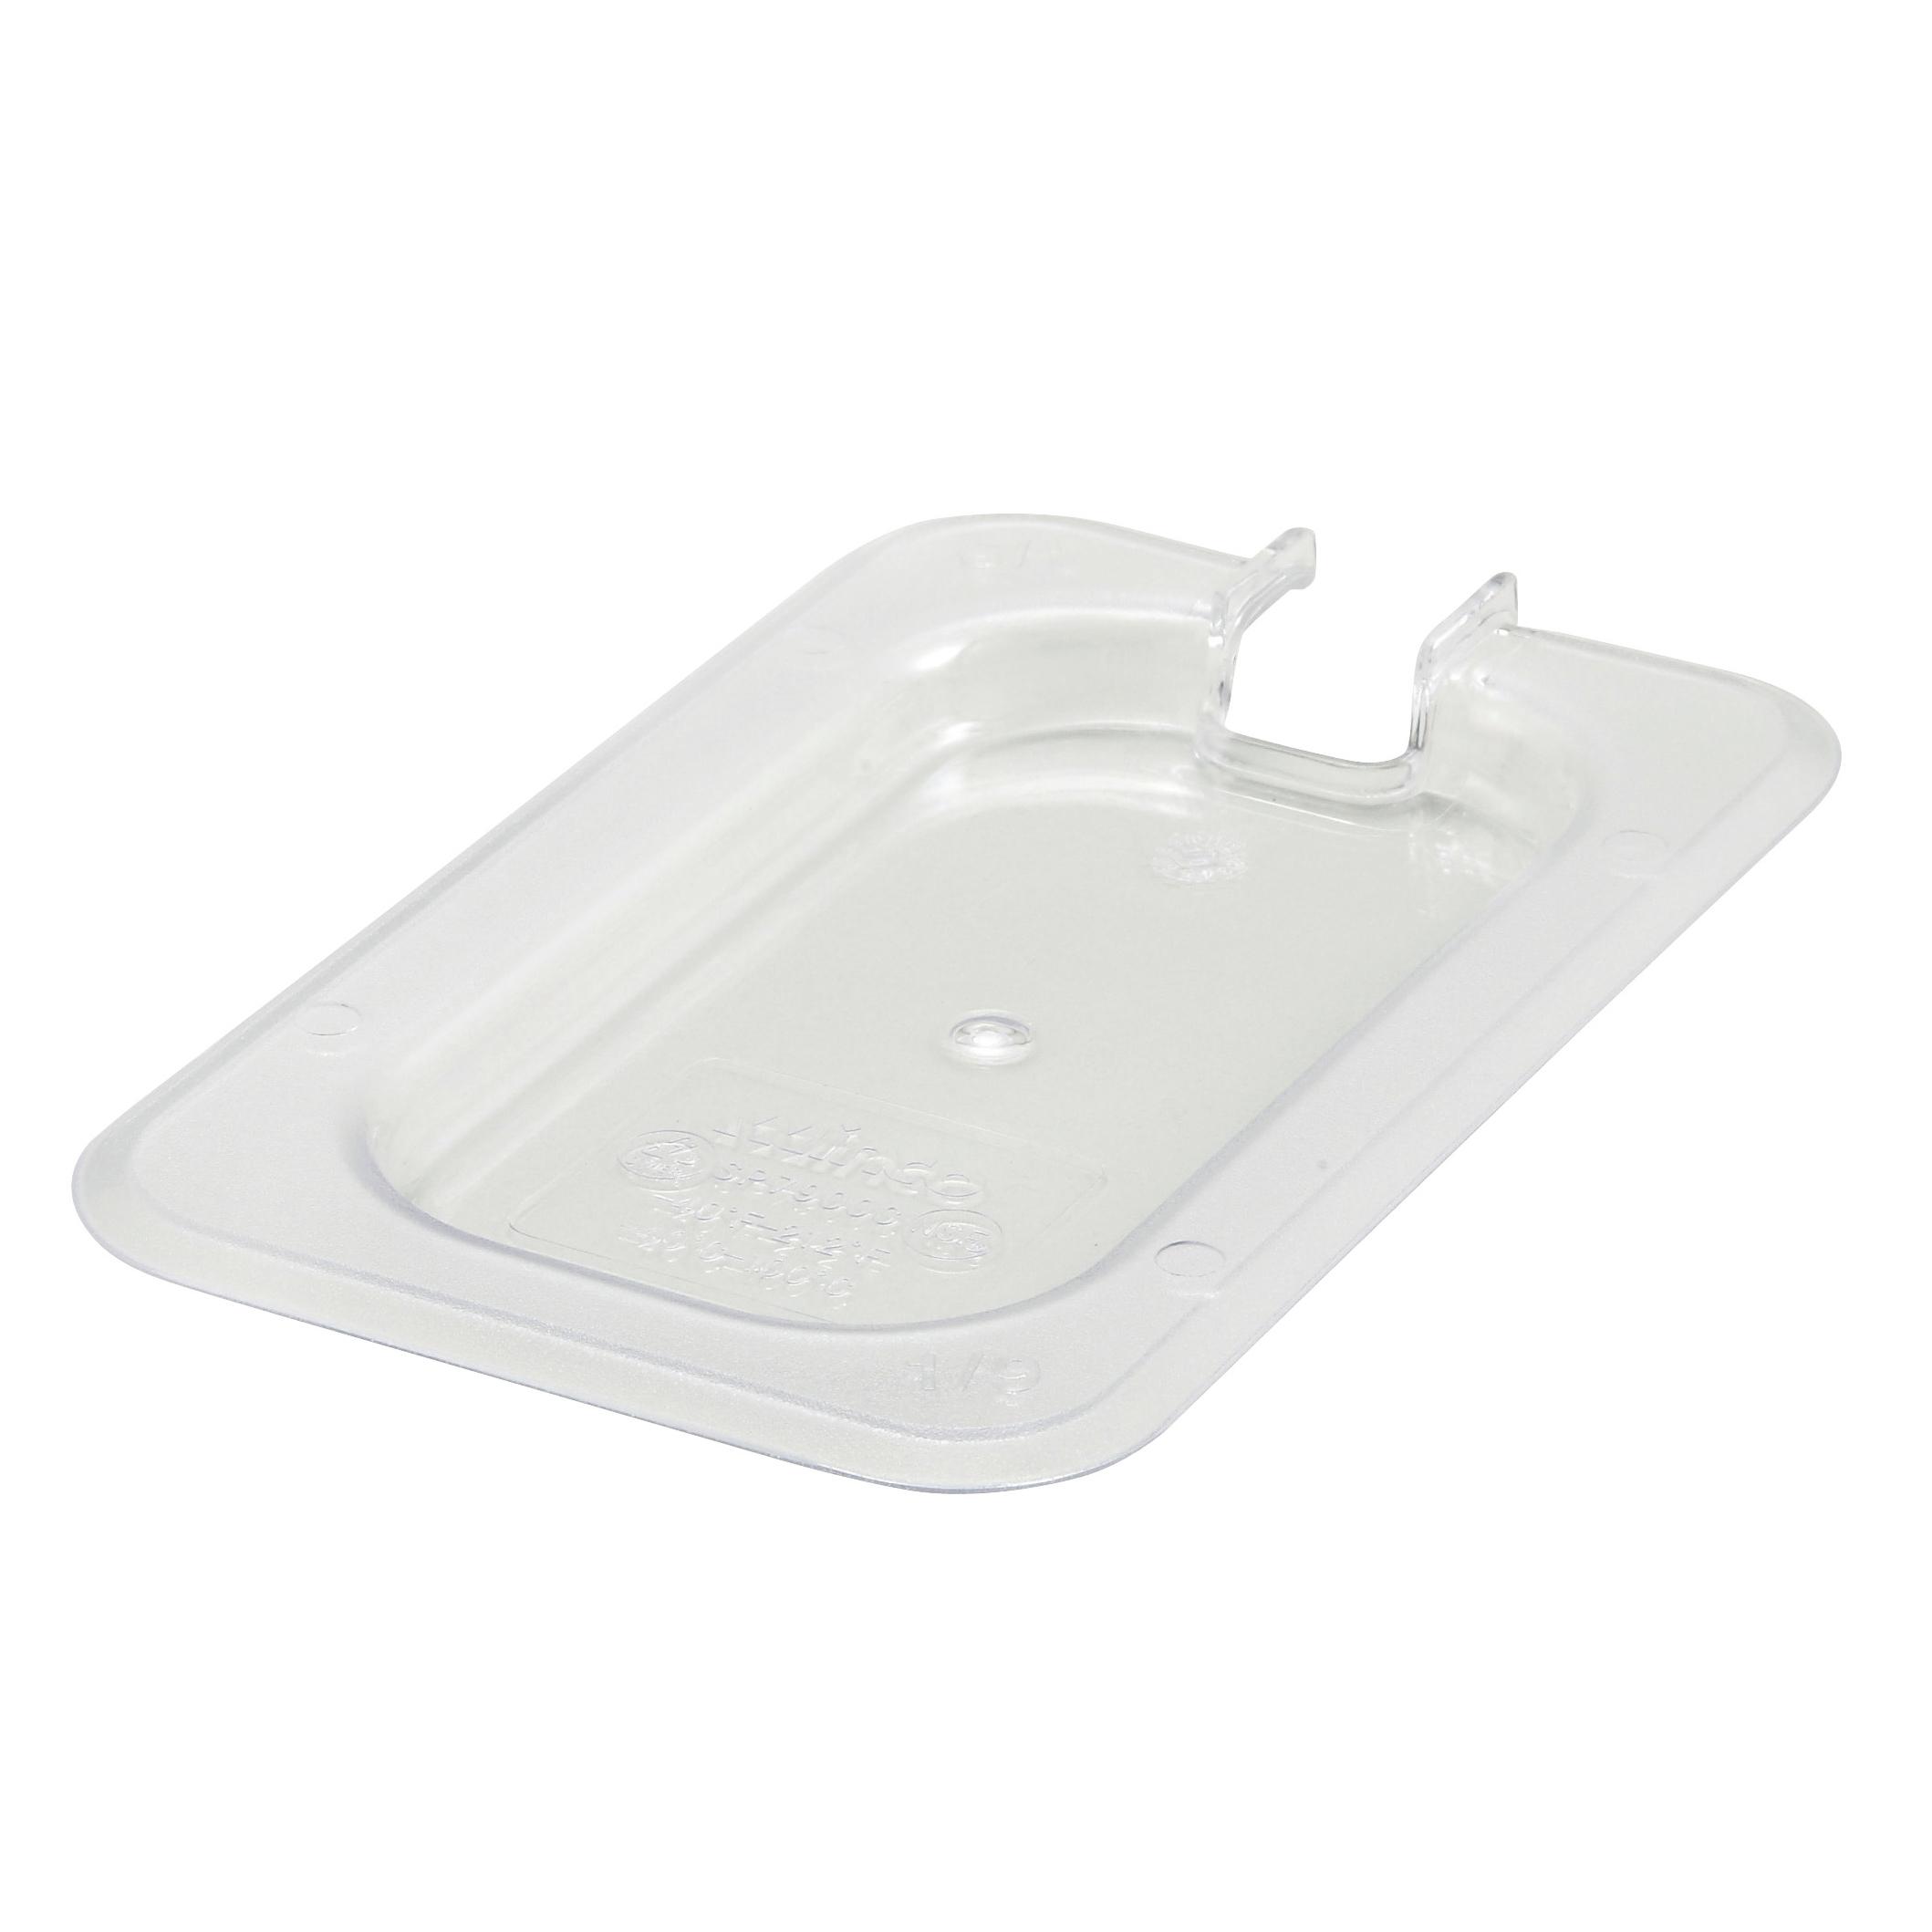 2410-044 Winco SP7900C food pan cover, plastic